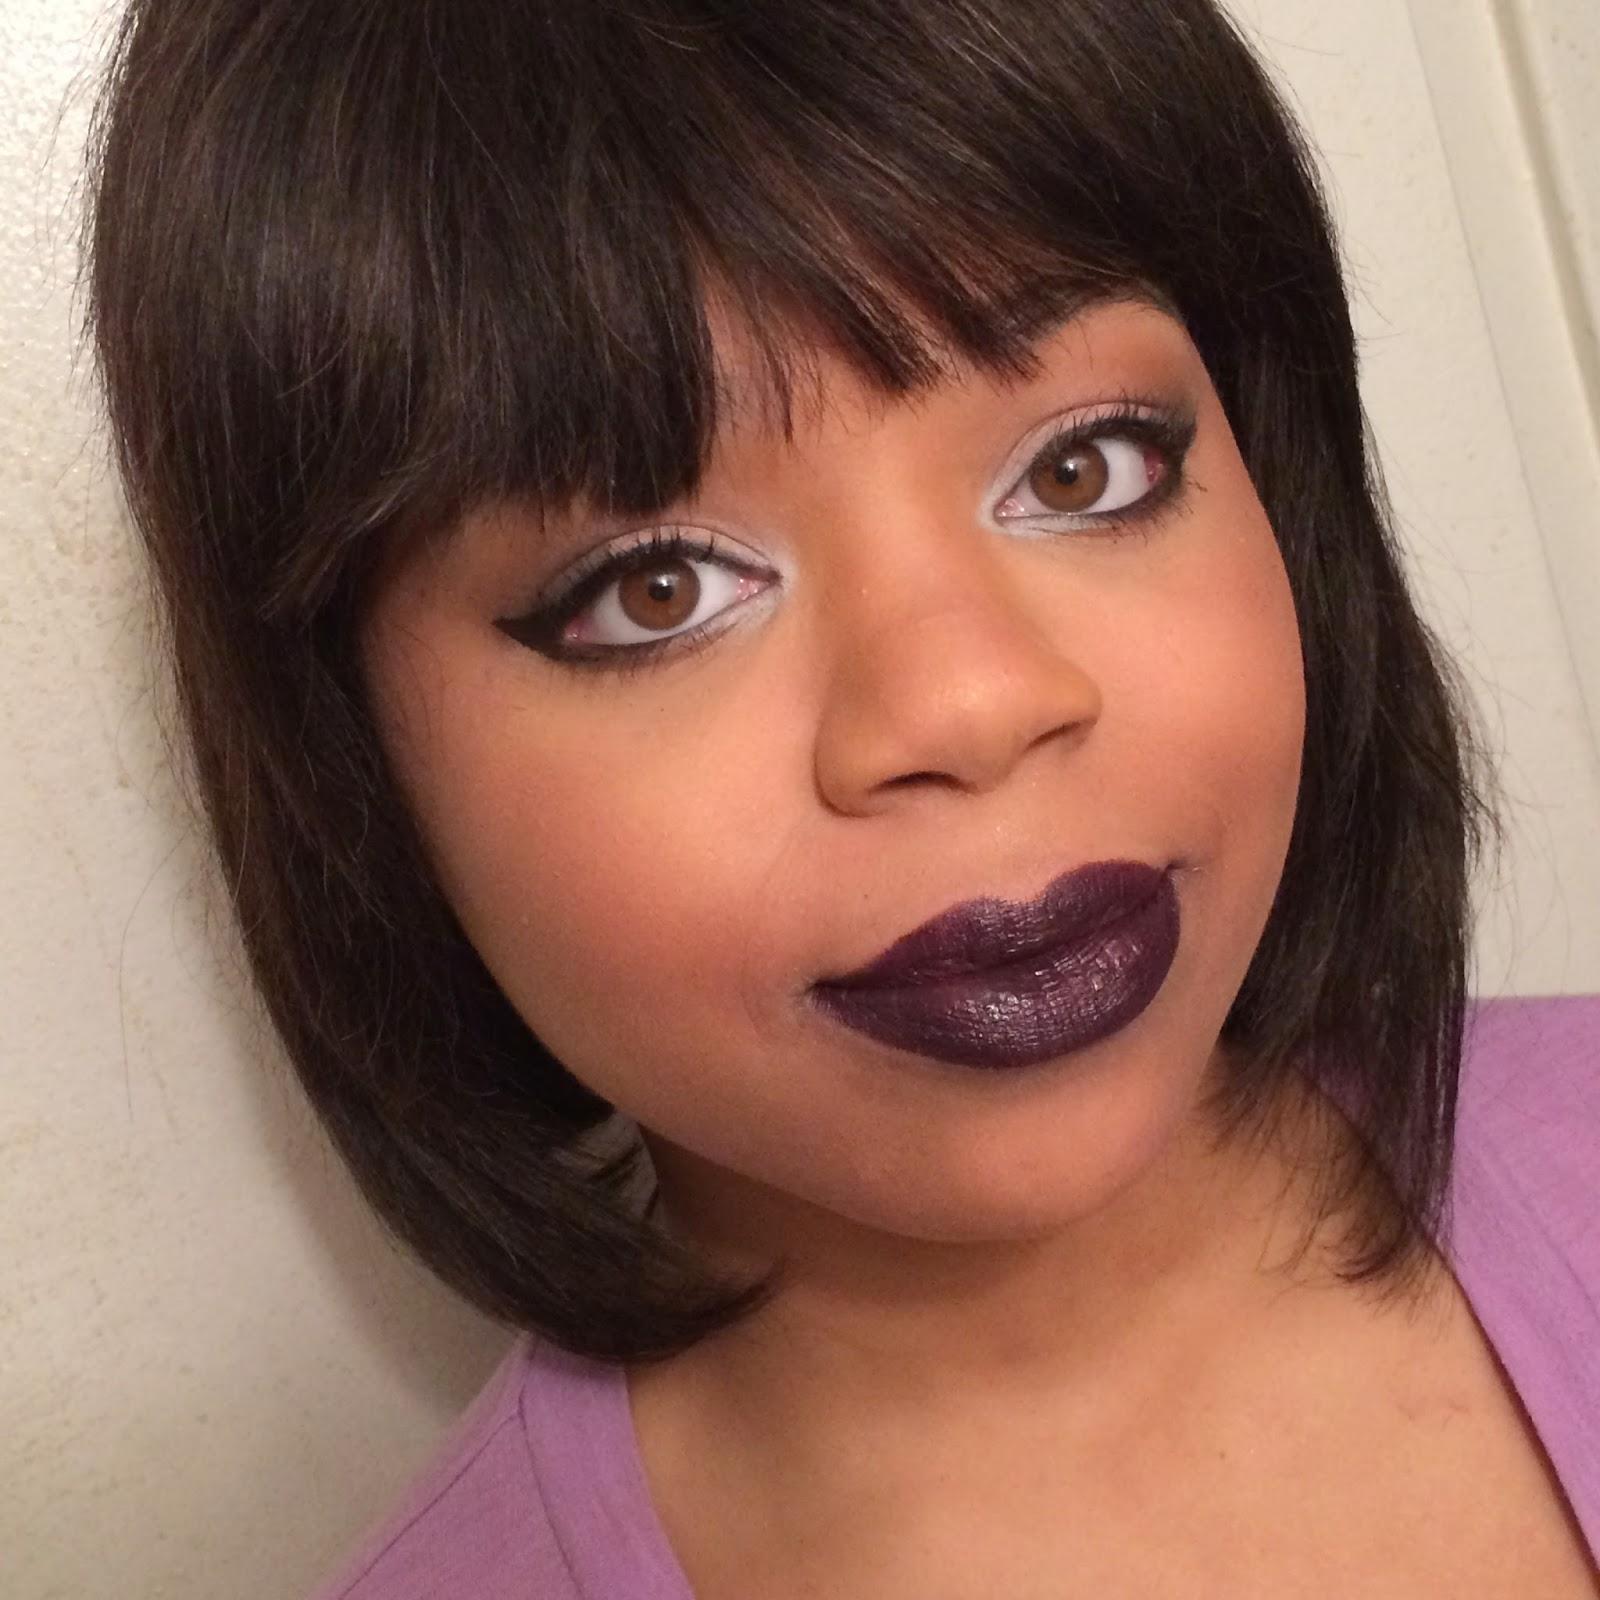 Ben noto yummy411.get it here!: Teen Yummy411 MAC Cyber Lipstick RF56